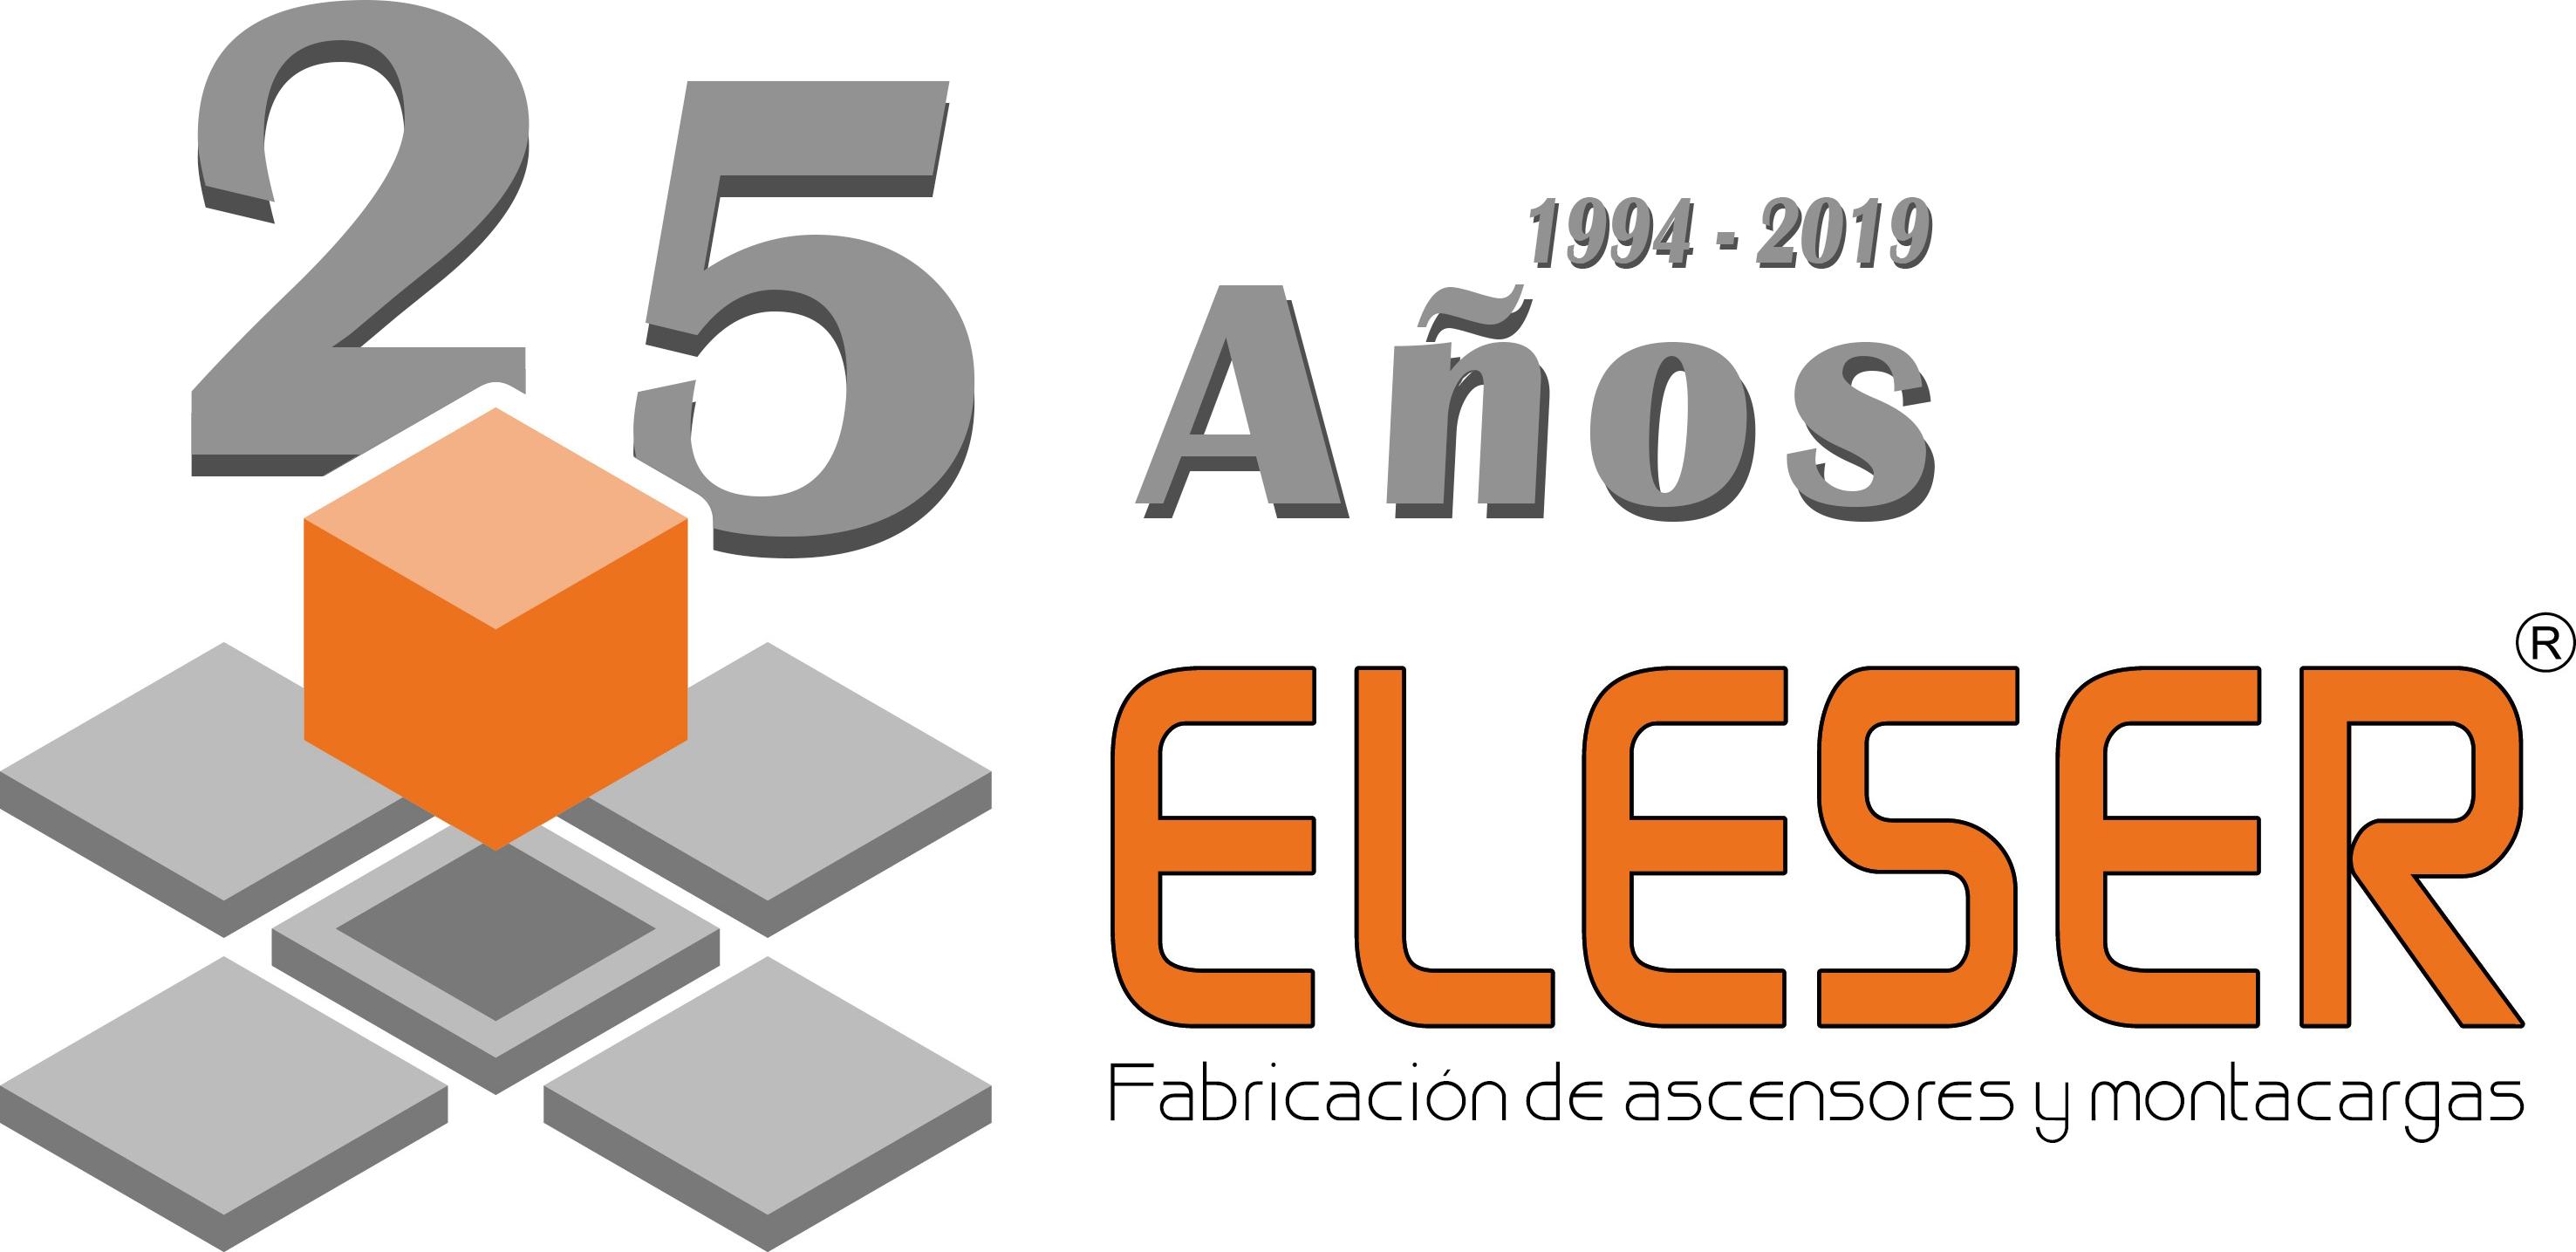 Robles Eleser S.l